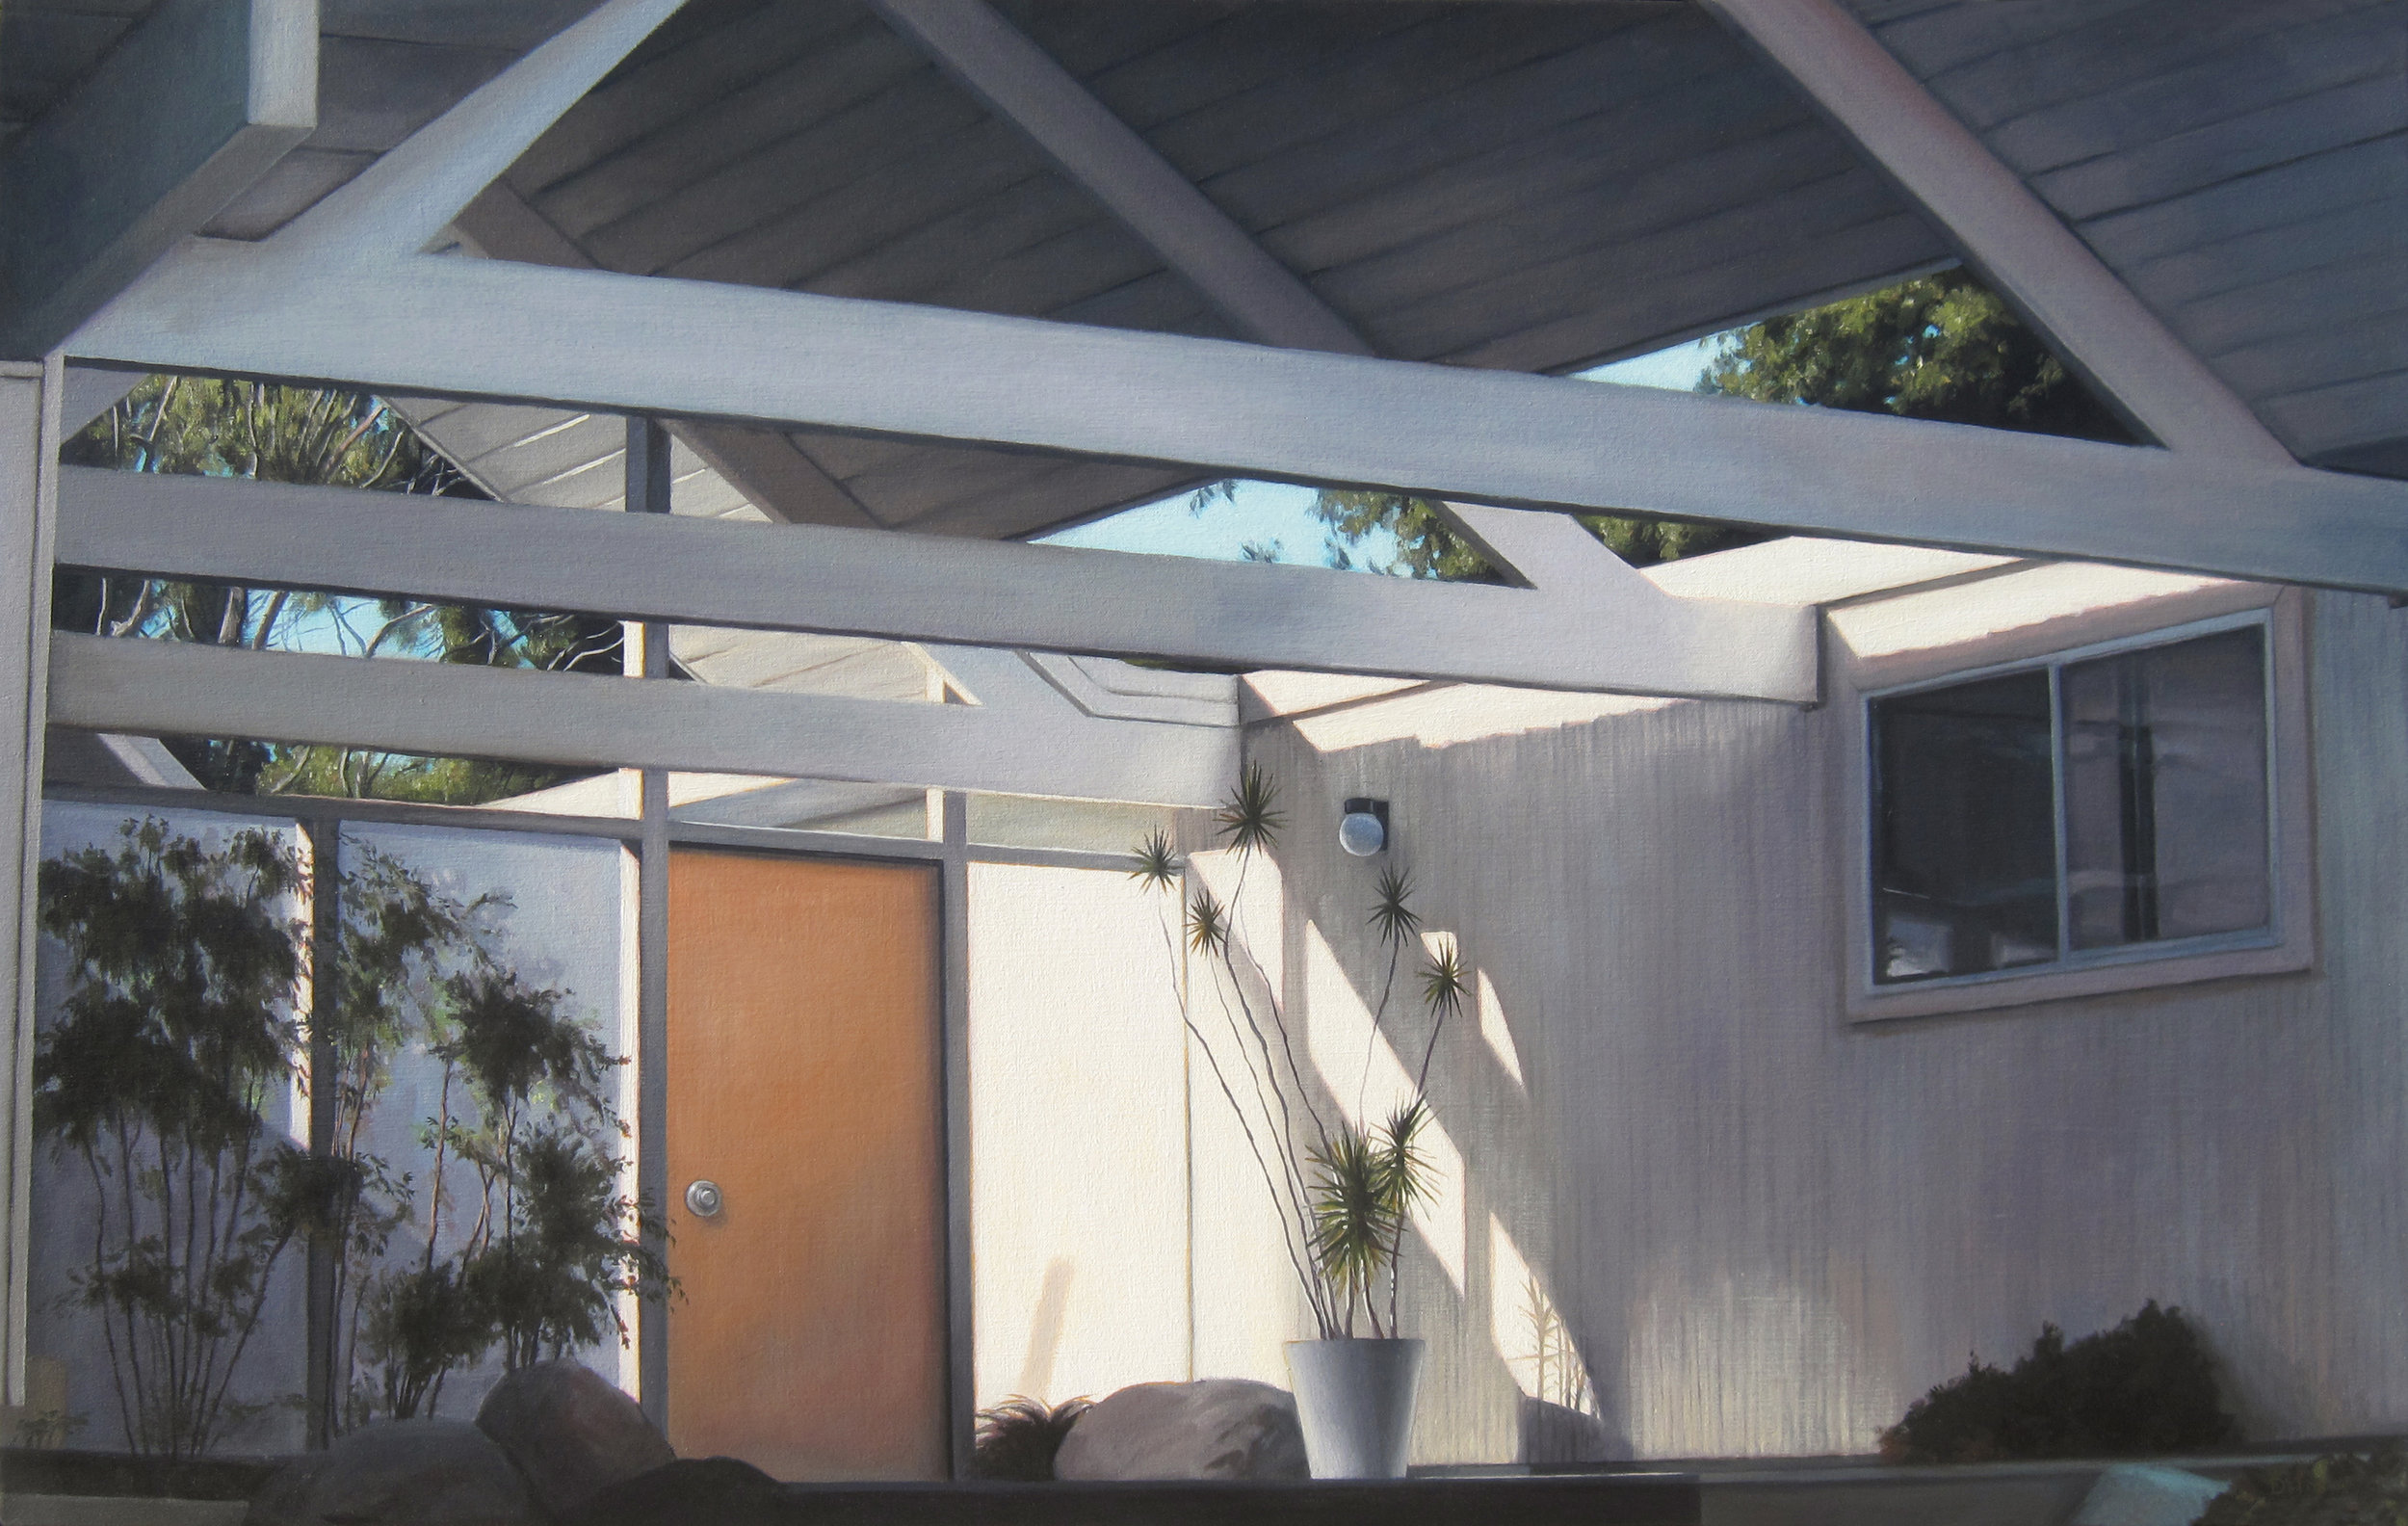 Eichler Carport Interior 2 Revised sized.jpg